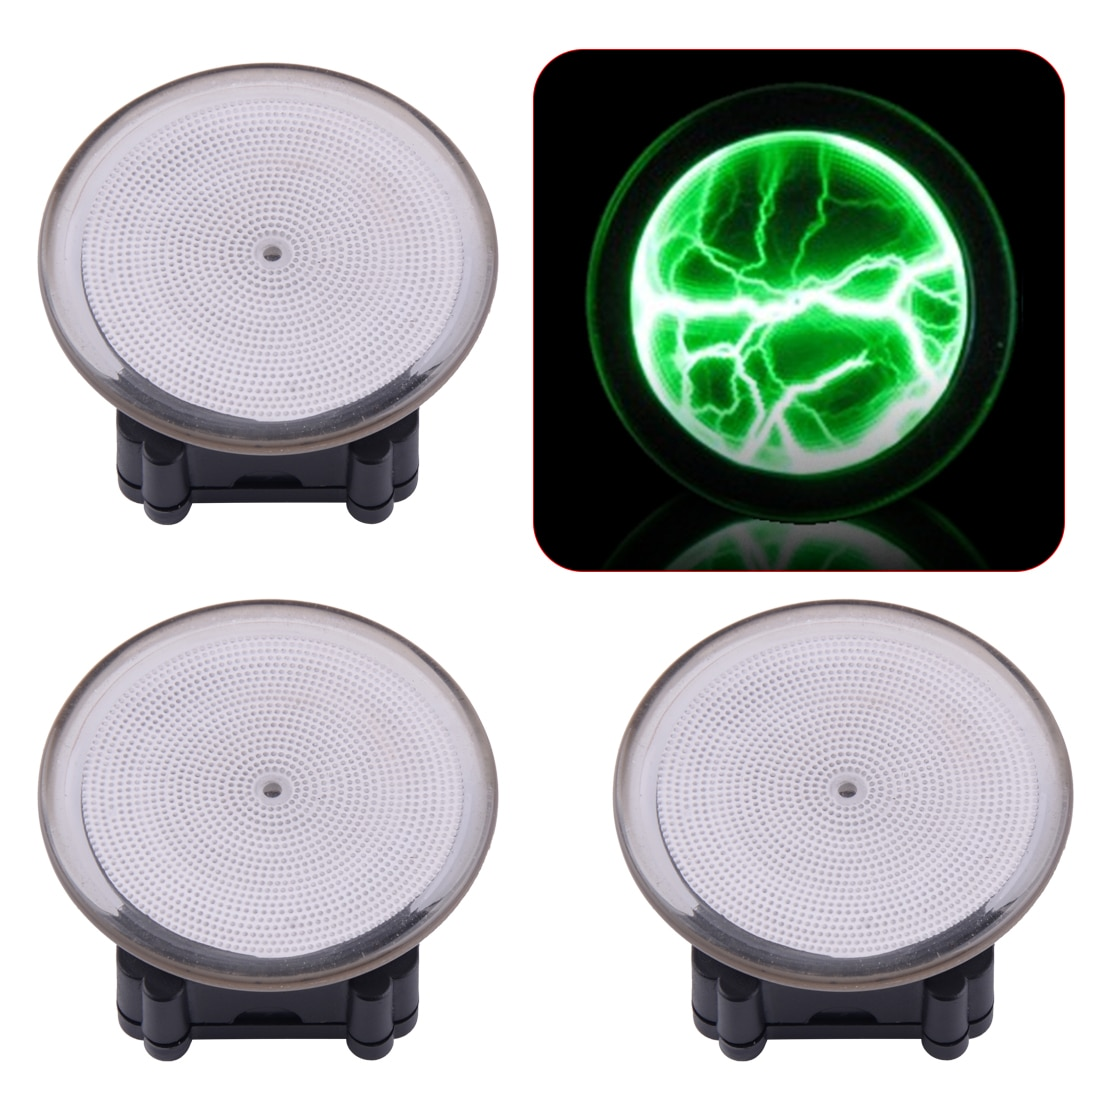 LETAOSK lindo colorido Mini bolsillo Plasma Disco Sensor Placa de luces casa decoración de Club Disco luz de noche vestido de decoración